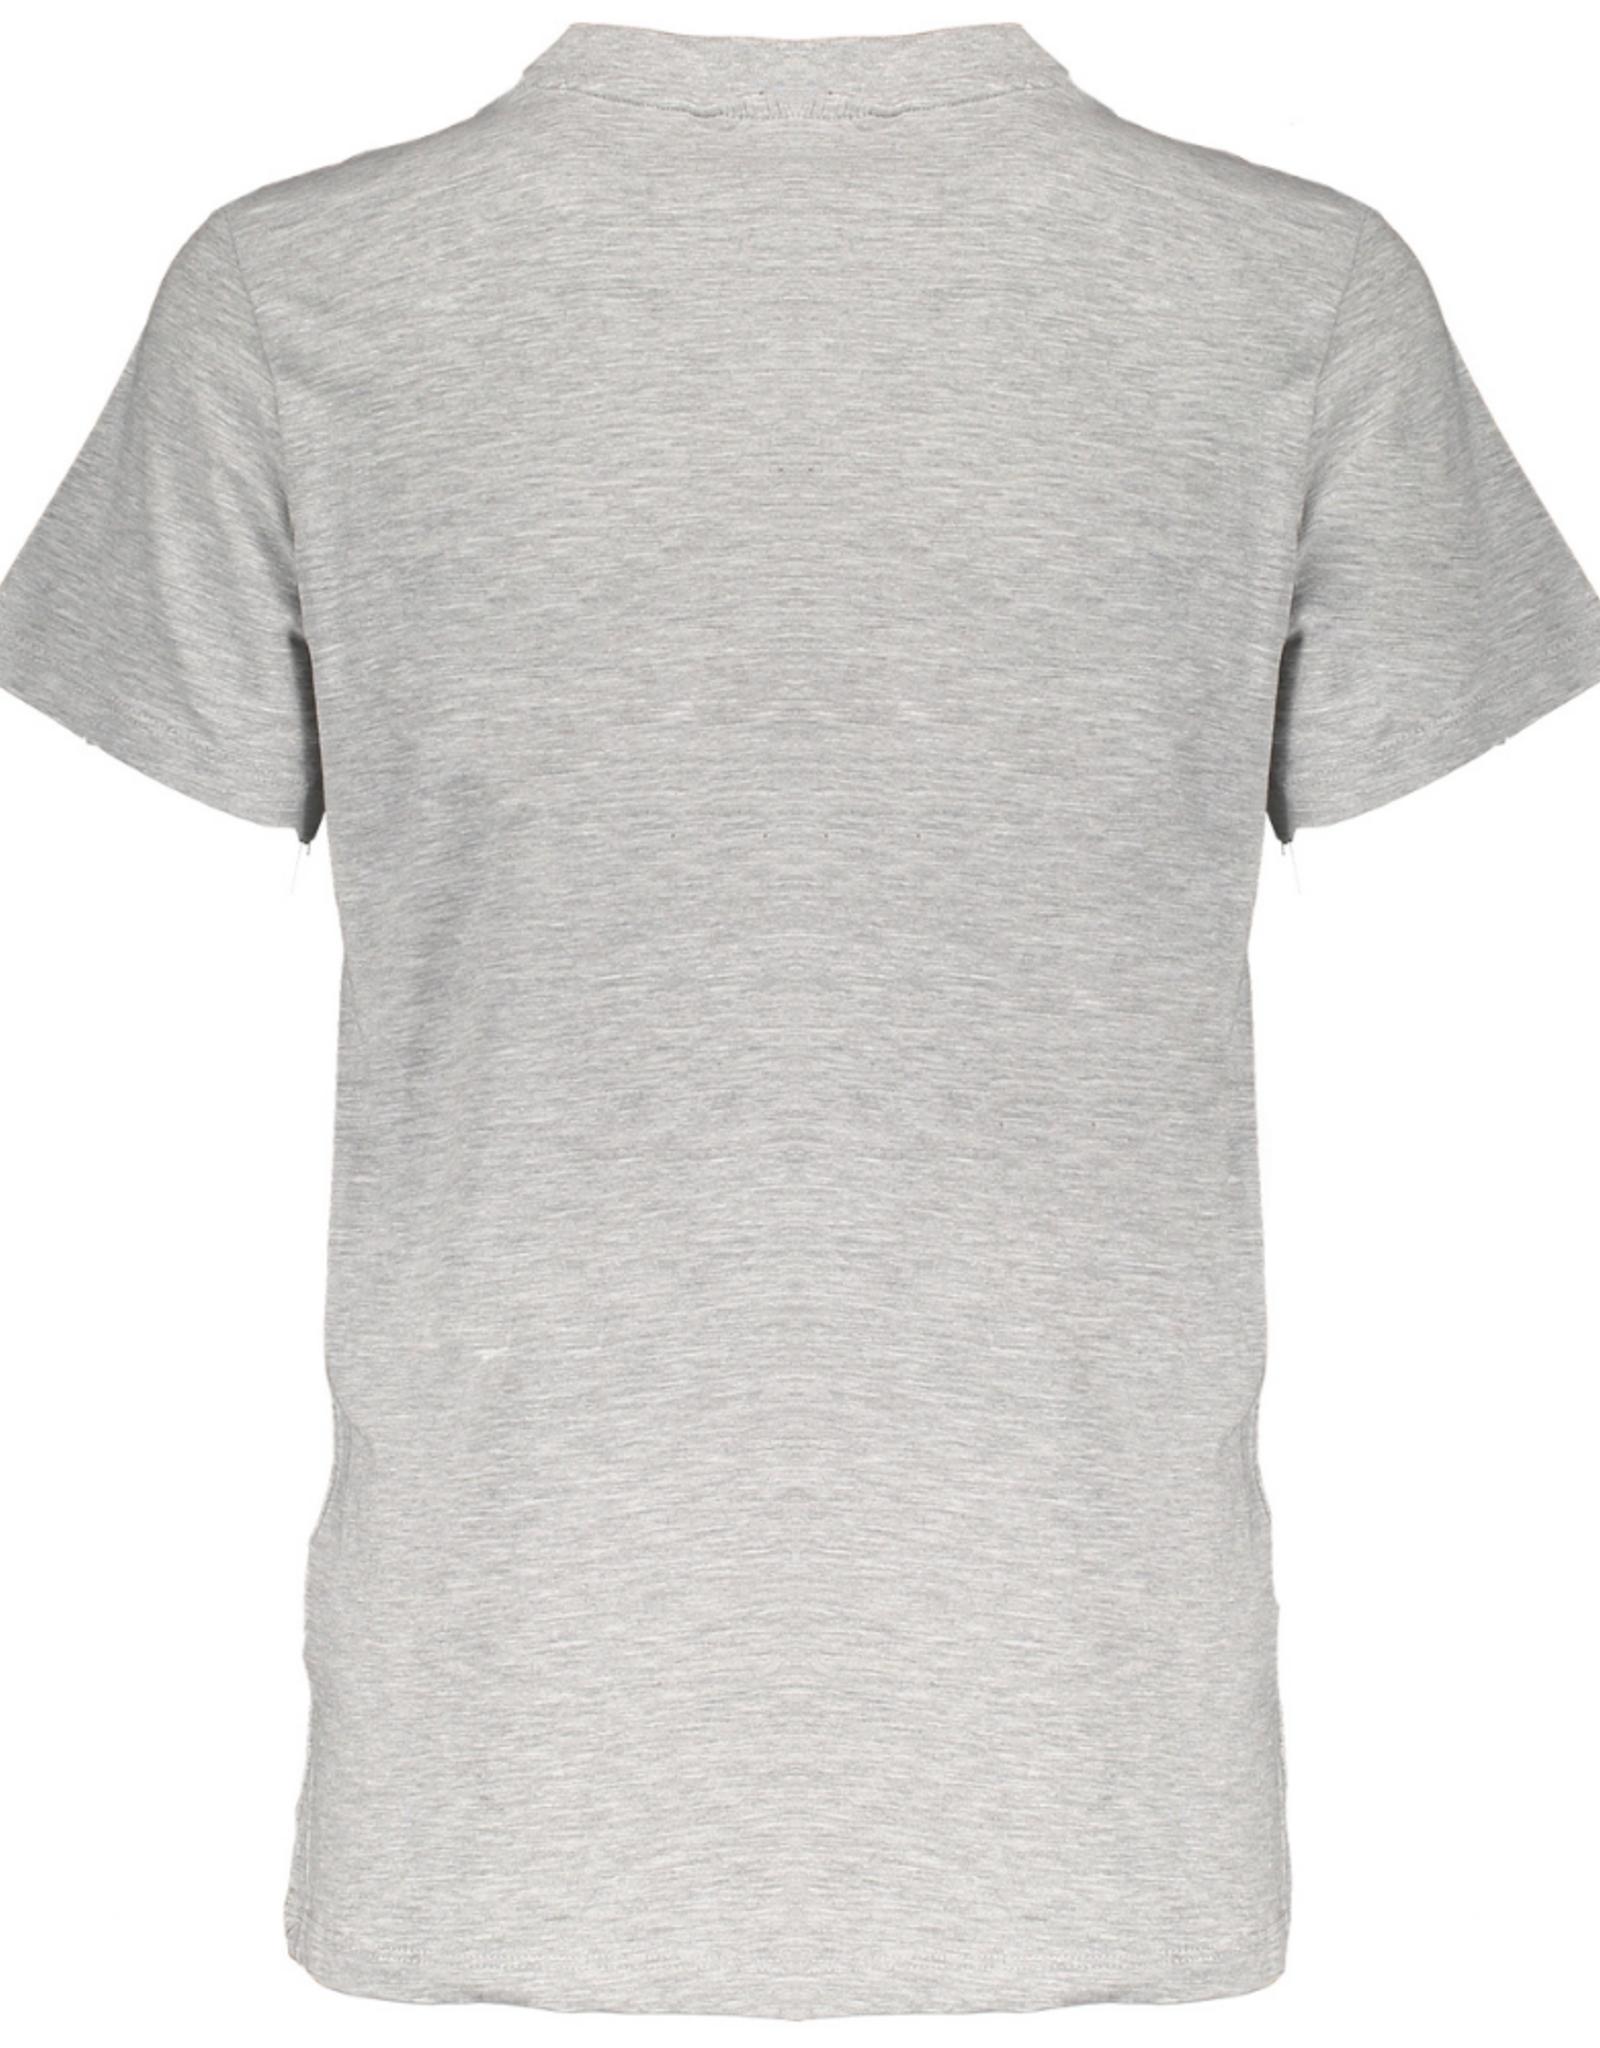 Bellaire BELLAIRE shirt 4413 light grey melee